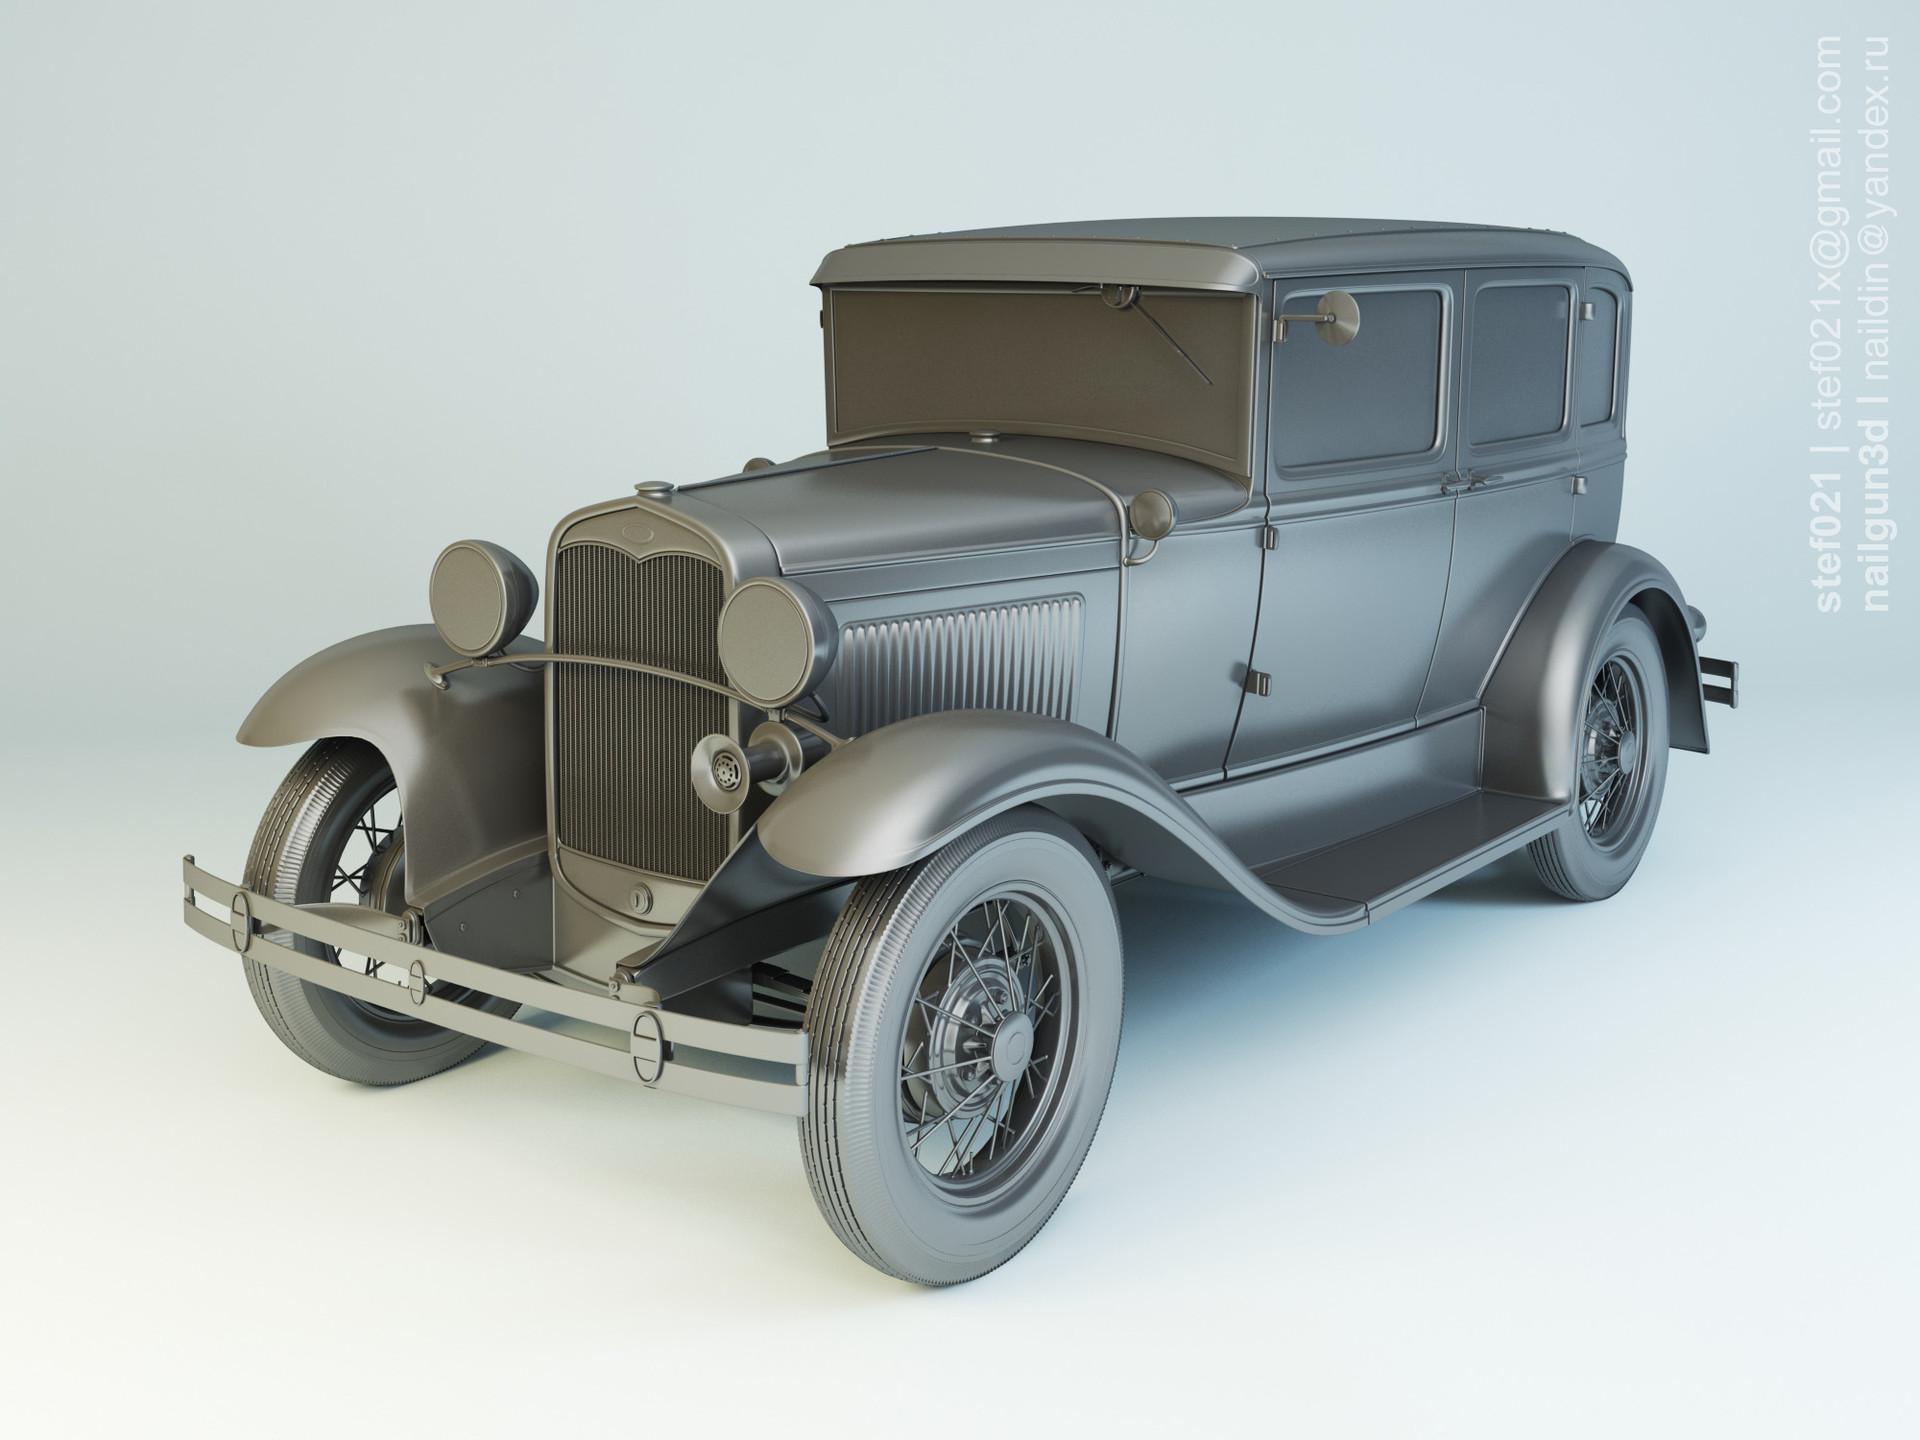 Nail khusnutdinov a0003 ford a fordor 1931 clay 0